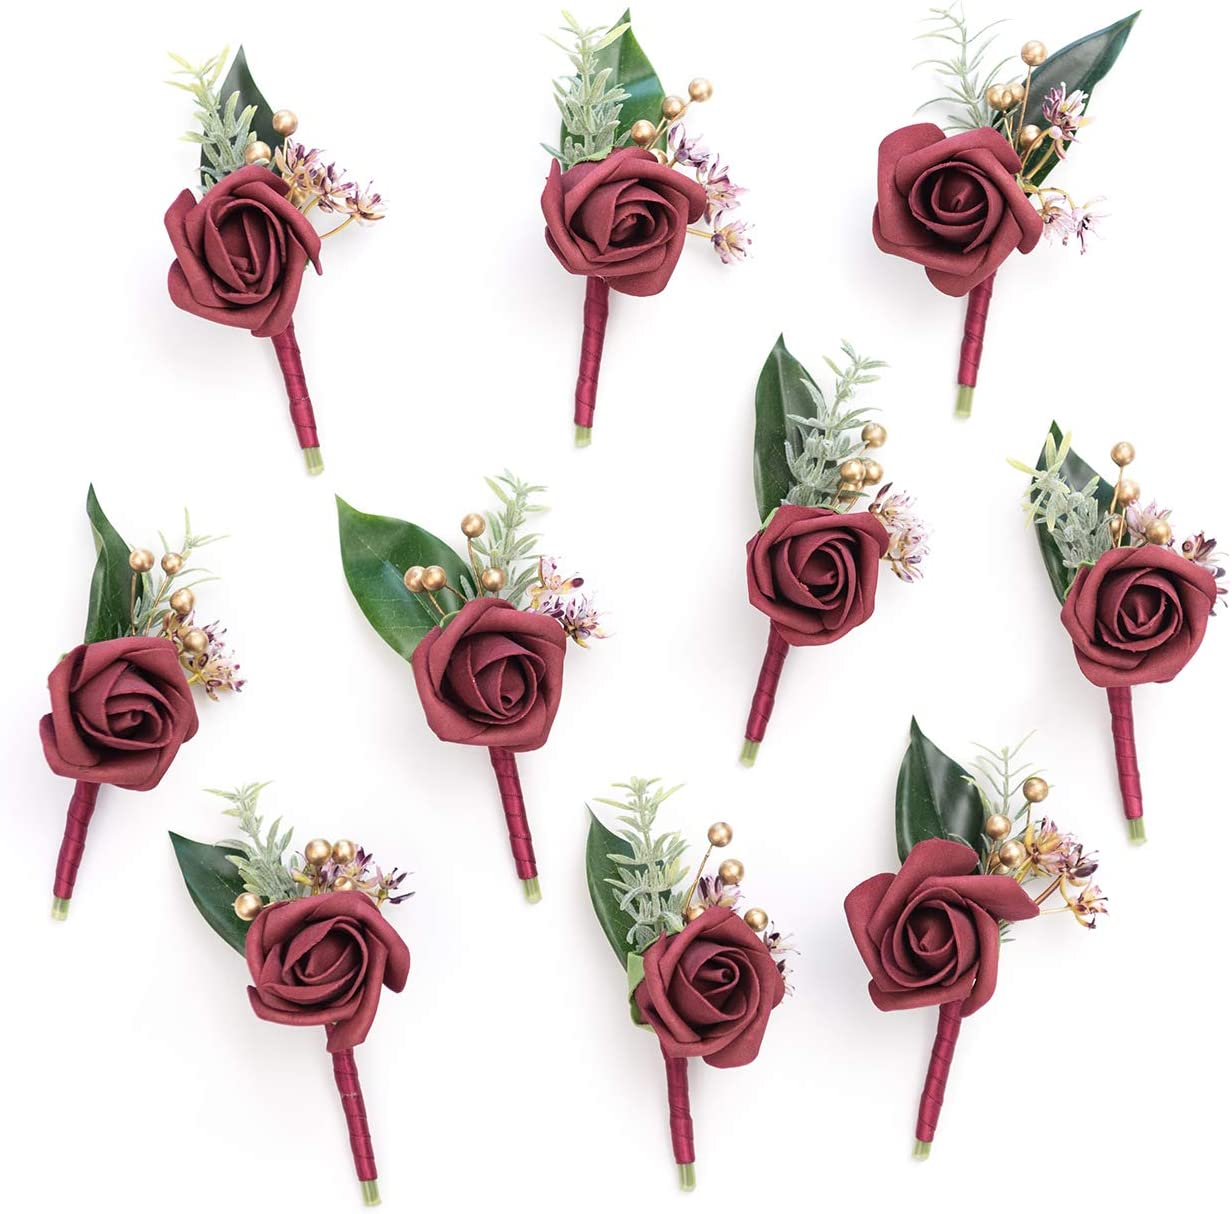 Groomsman boutonniere man boutonniere Rustic boutonniere Burgundy flower boutonniere